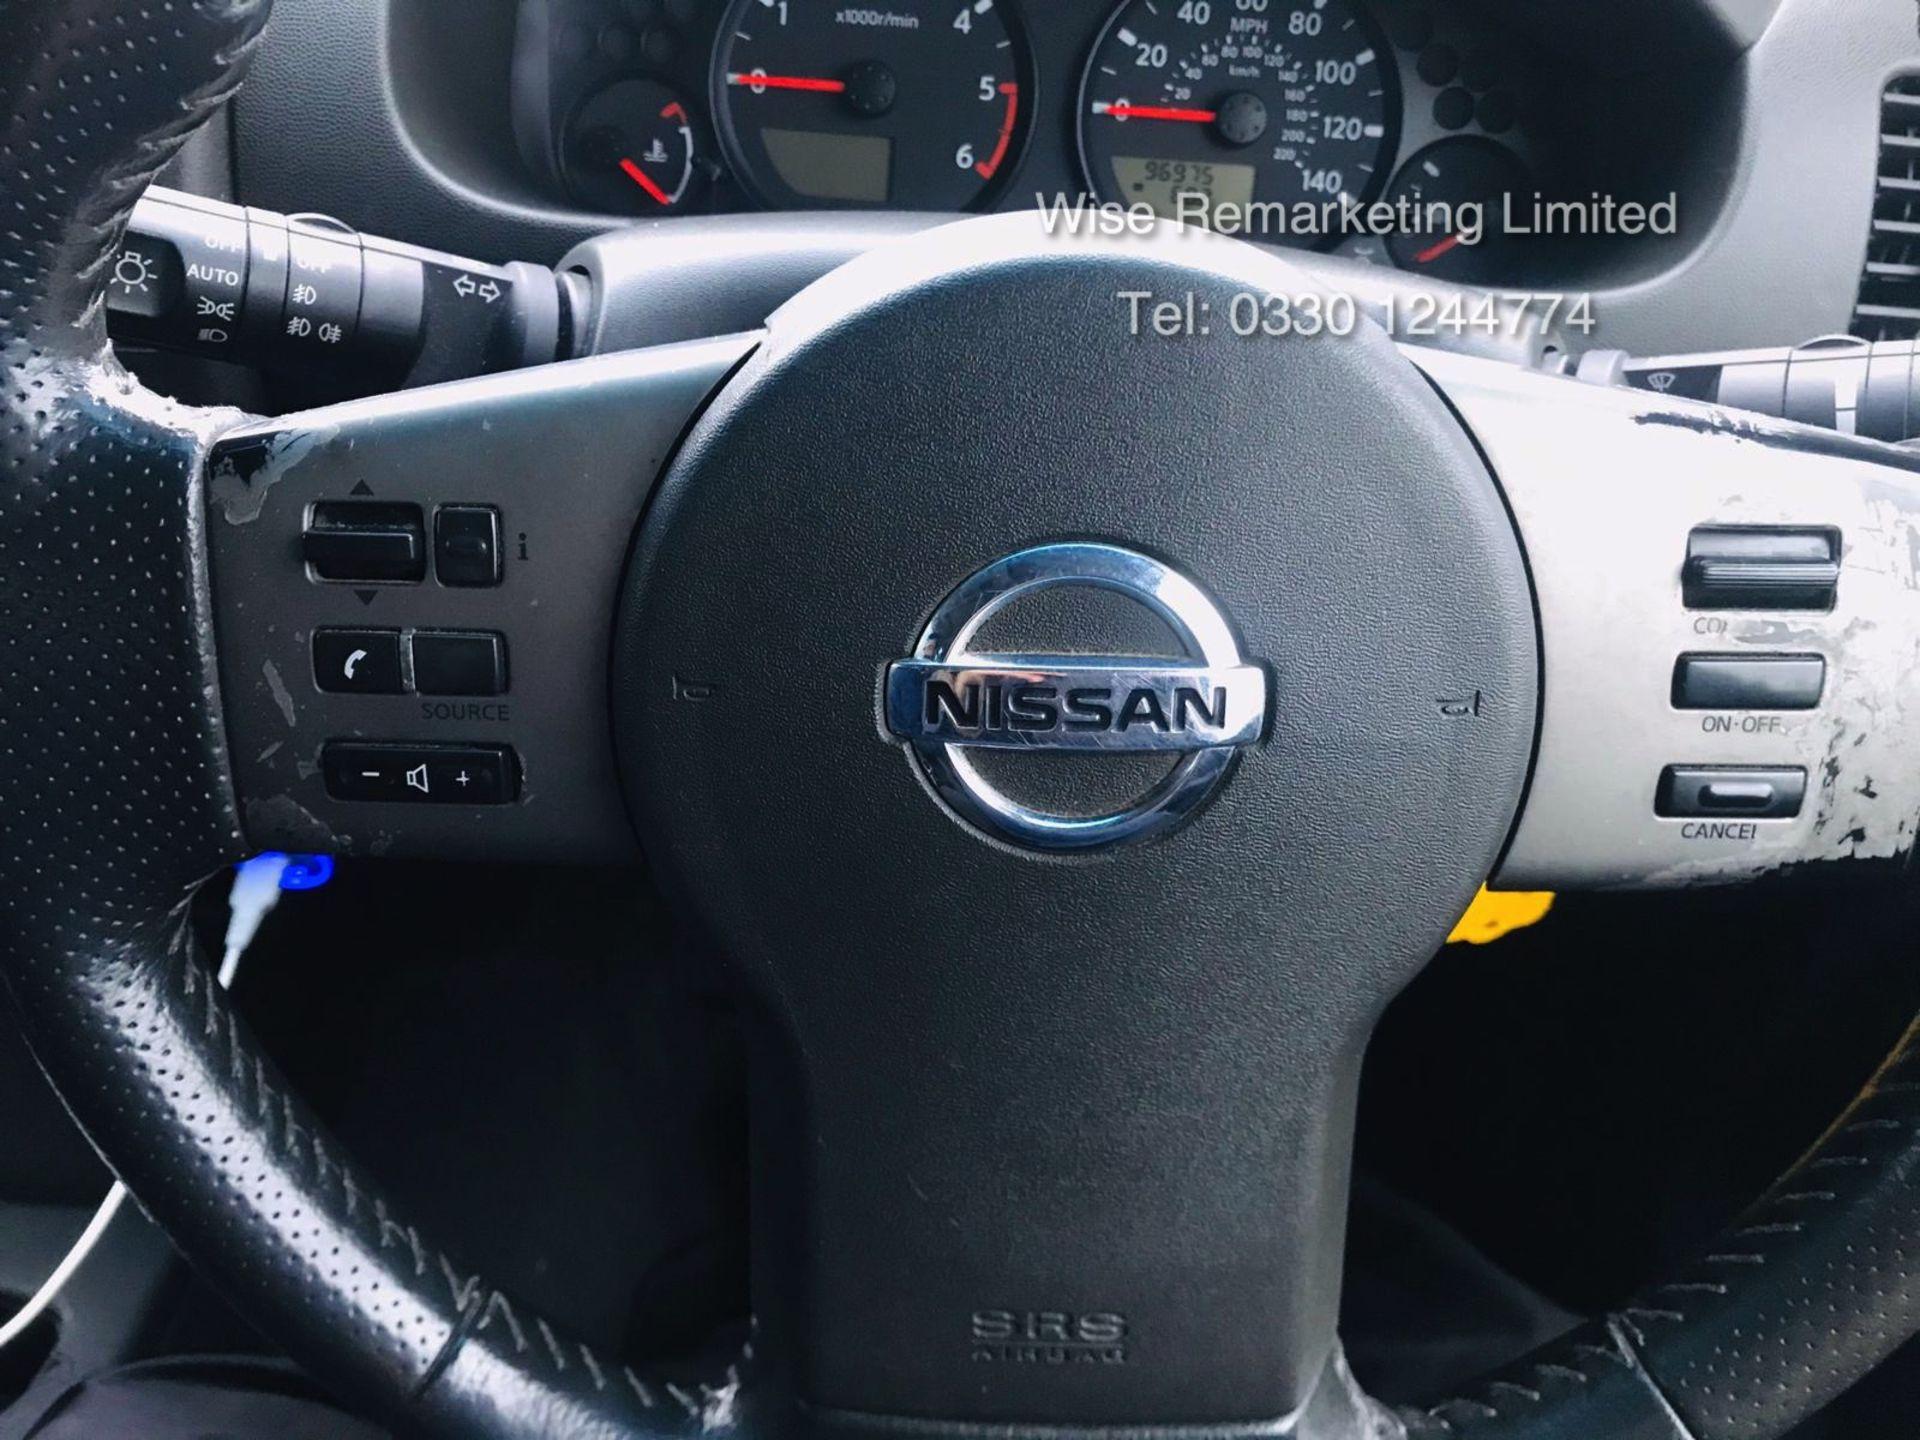 Lot 22 - Nissan Navara Die Hard Special Edition 4.0 2.5DCI Auto - 2008 Model - Service History - Air Con